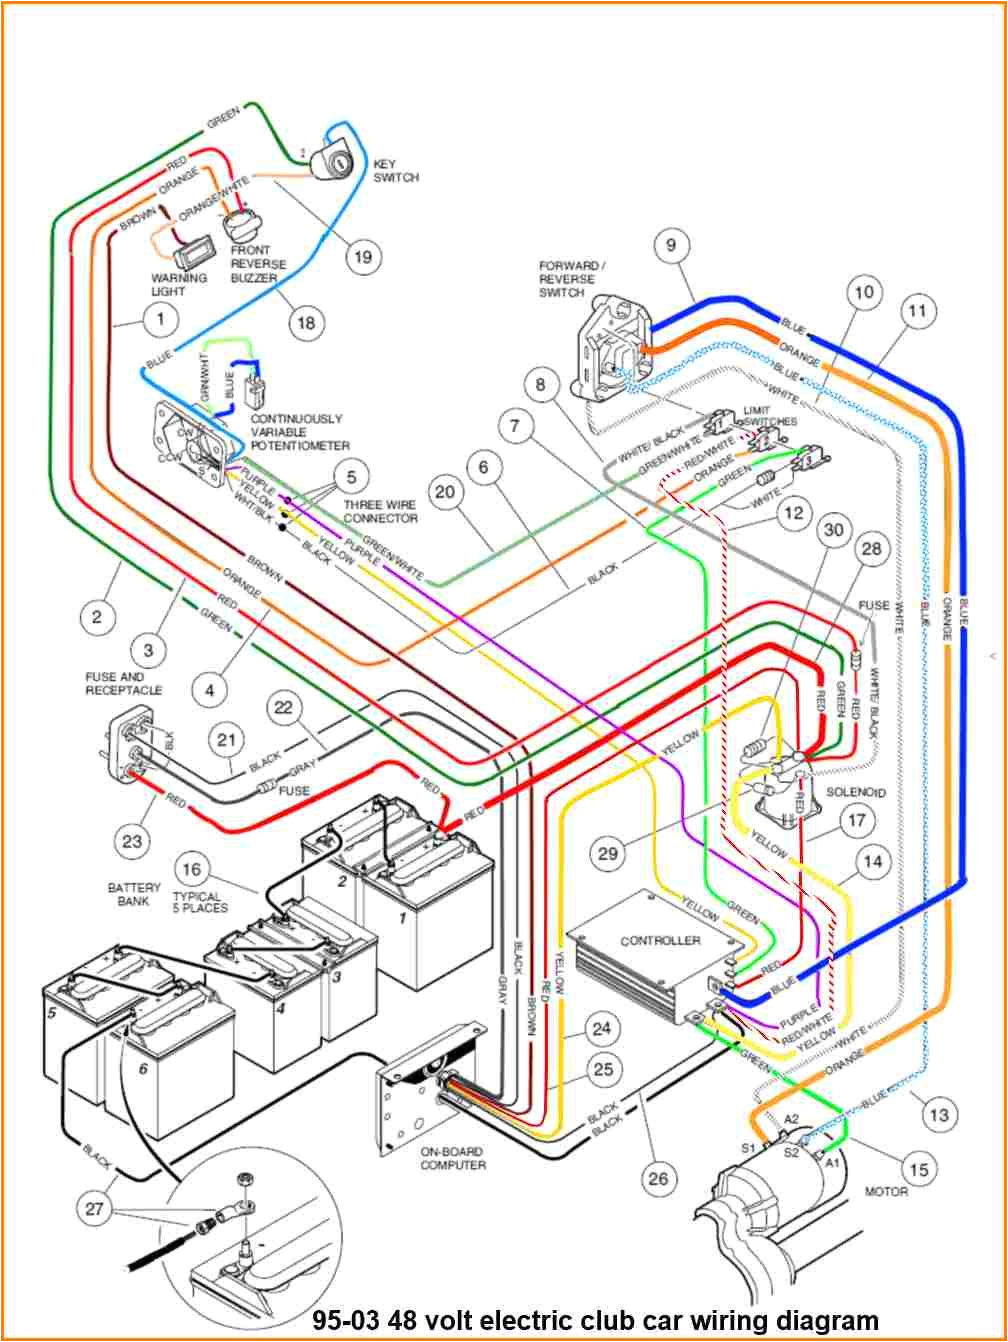 48 Volt Club Car Wiring Diagram 84 Club Car Wiring Diagram Wiring Diagram Expert